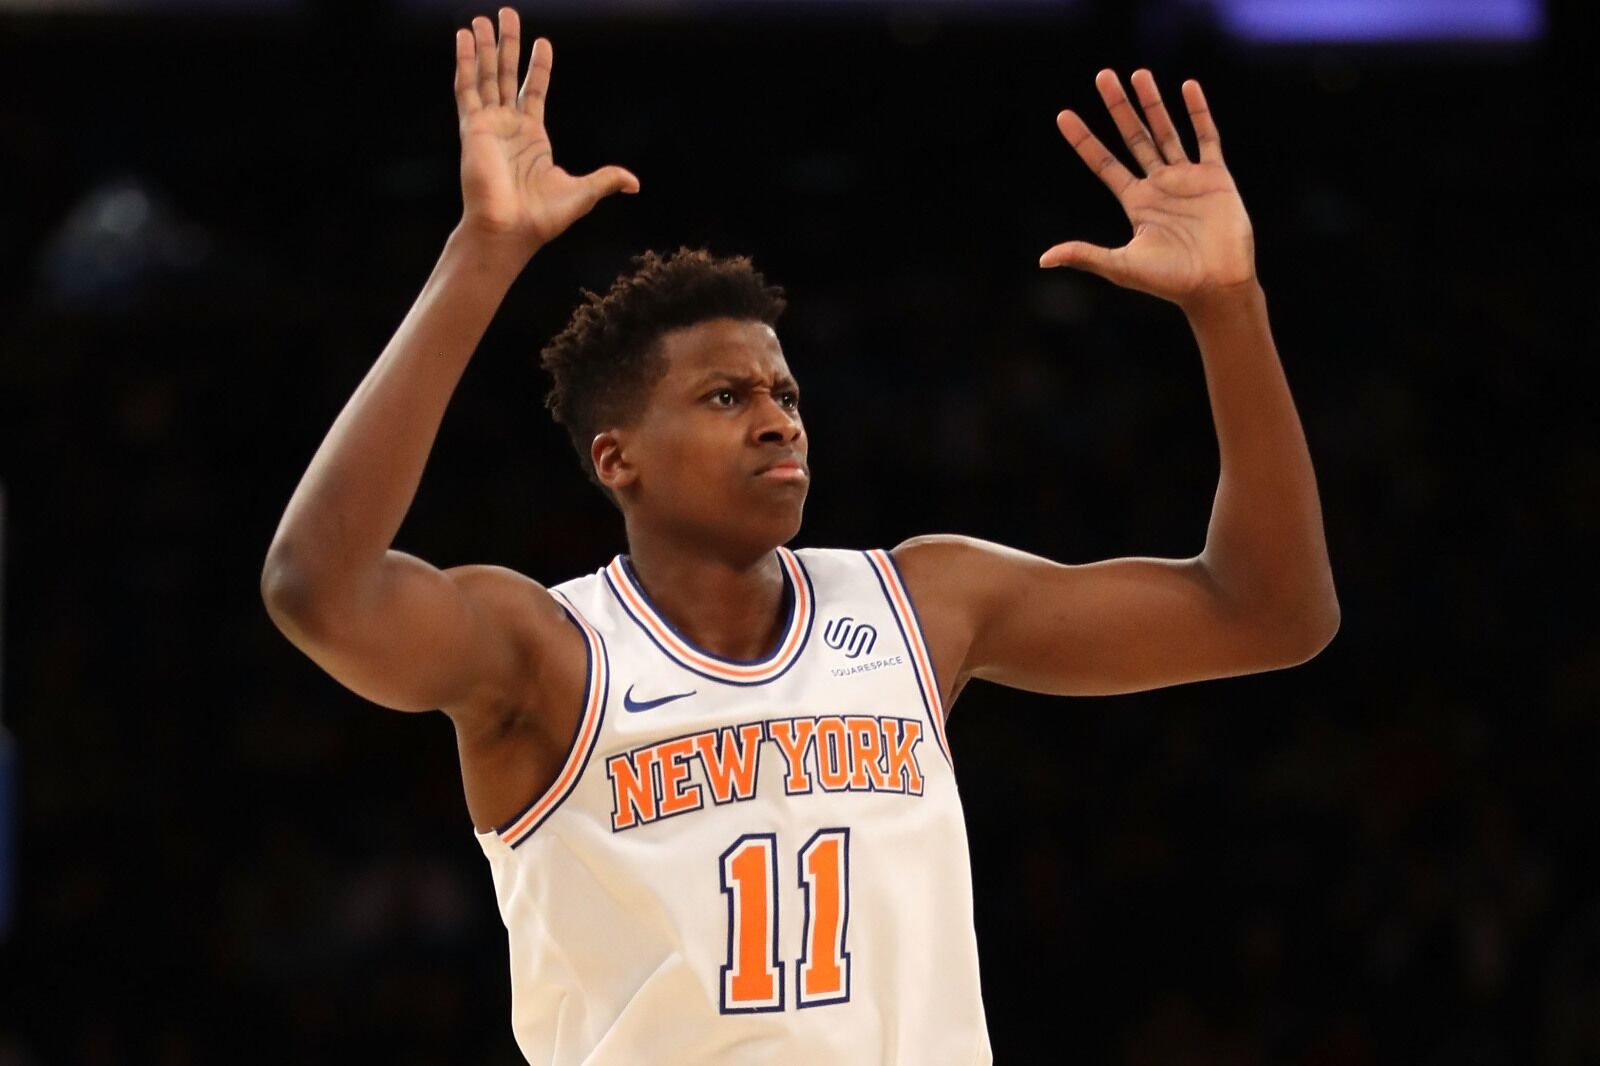 New York Knicks: Frank Ntilikina should be the starting point guard